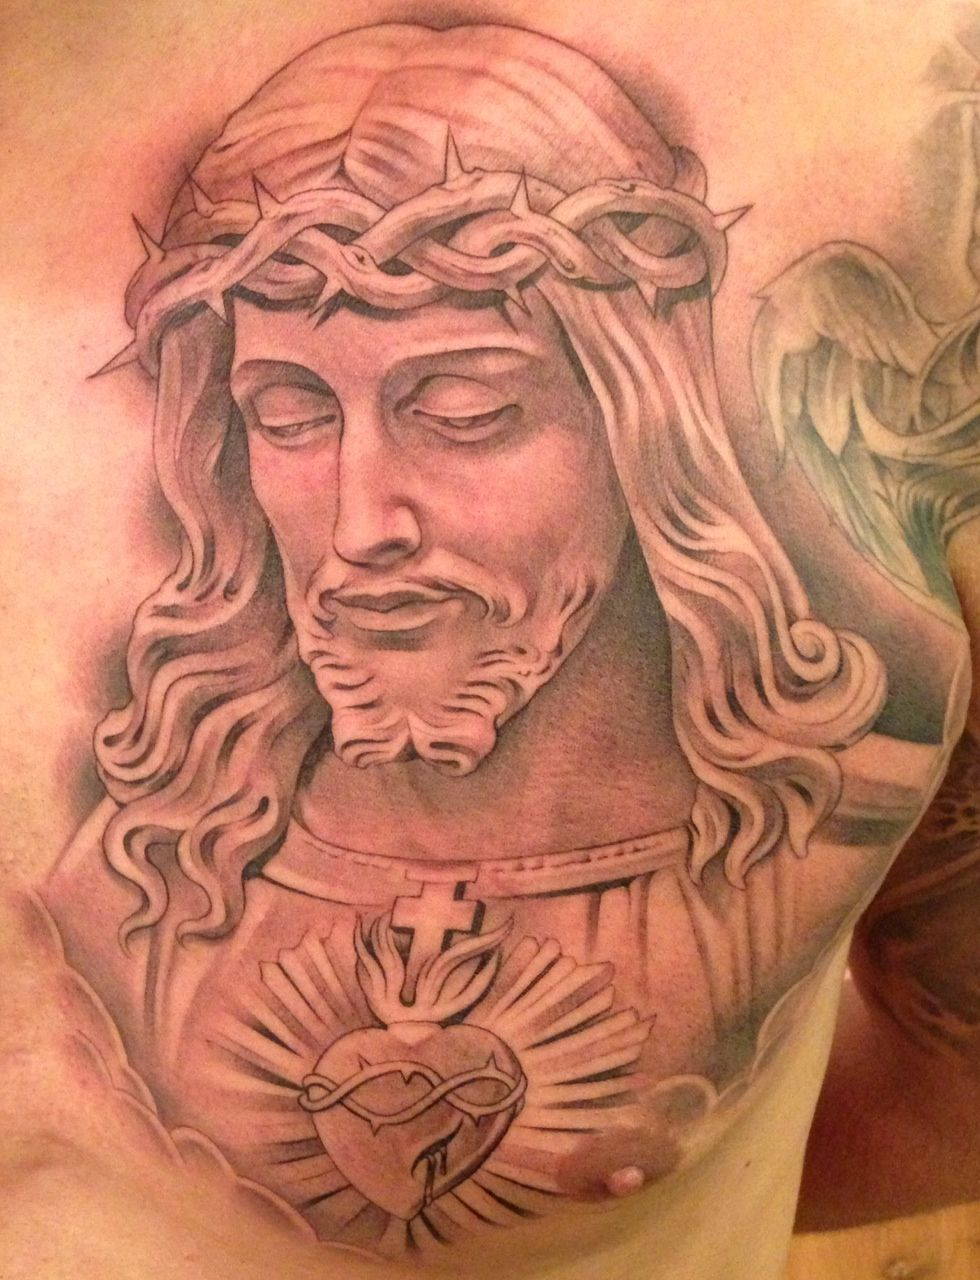 Tattoos jesus may have gotten jesus tattoo tattoo and for Tattoo of jesus